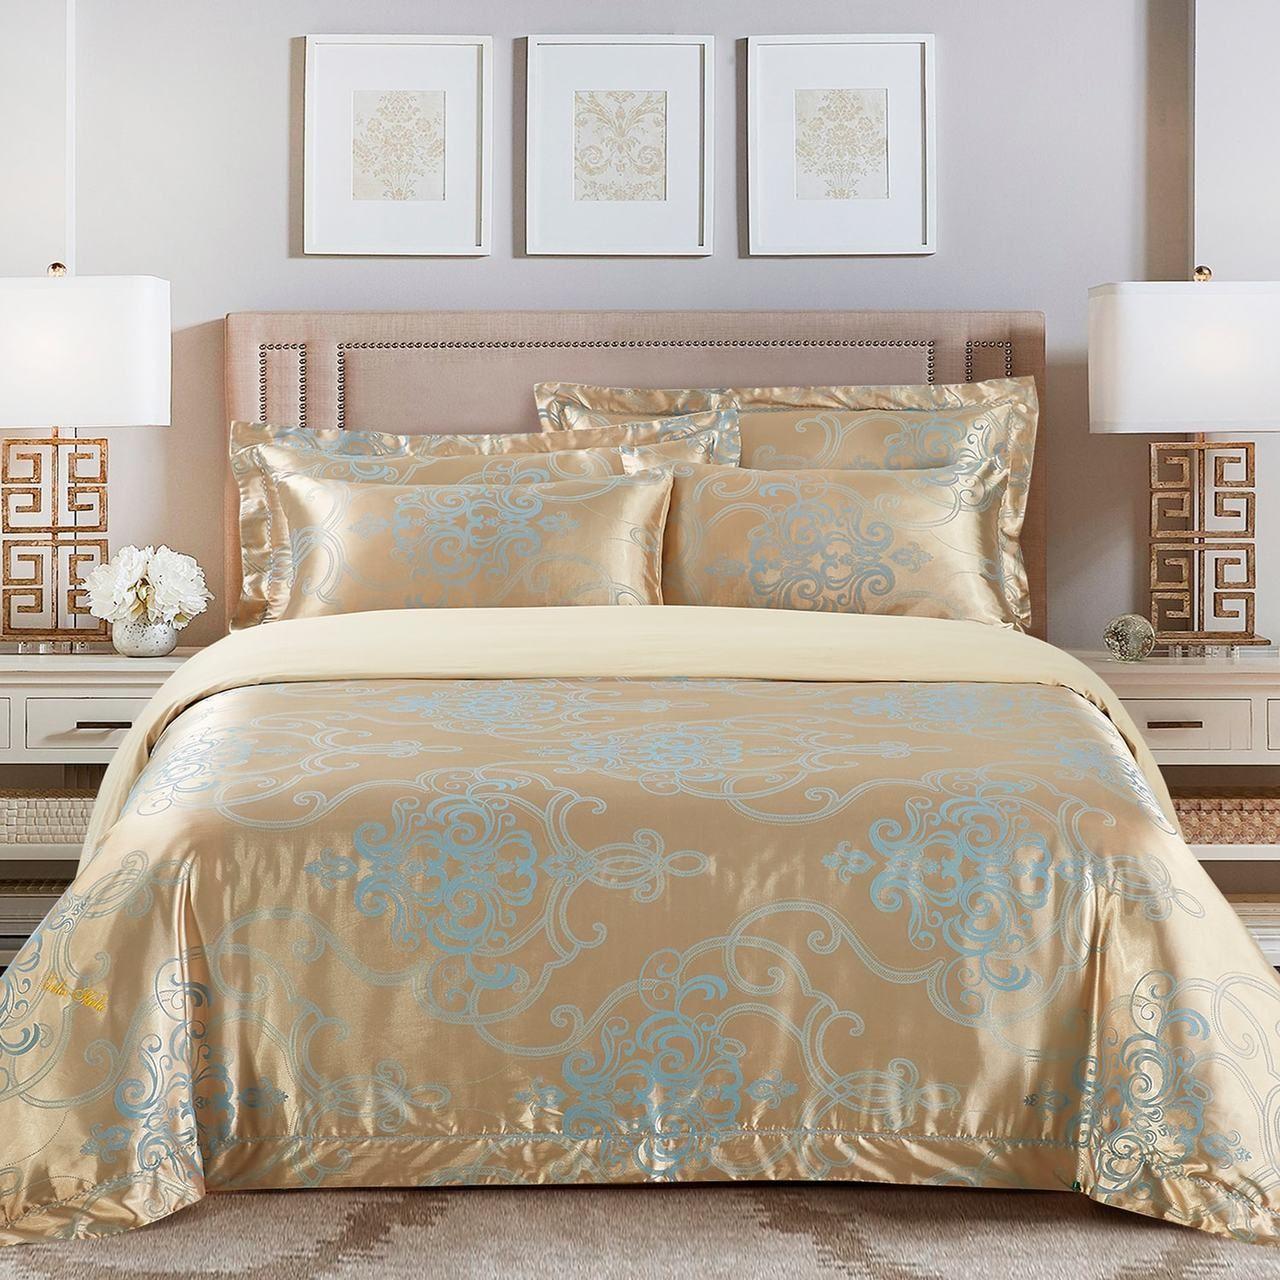 Dm505q Dolce Mela Bedding San Marino Luxury Jacquard Queen Size Duvet Cover Set Queen Size Duvet Covers Duvet Cover Sets King Size Duvet Covers